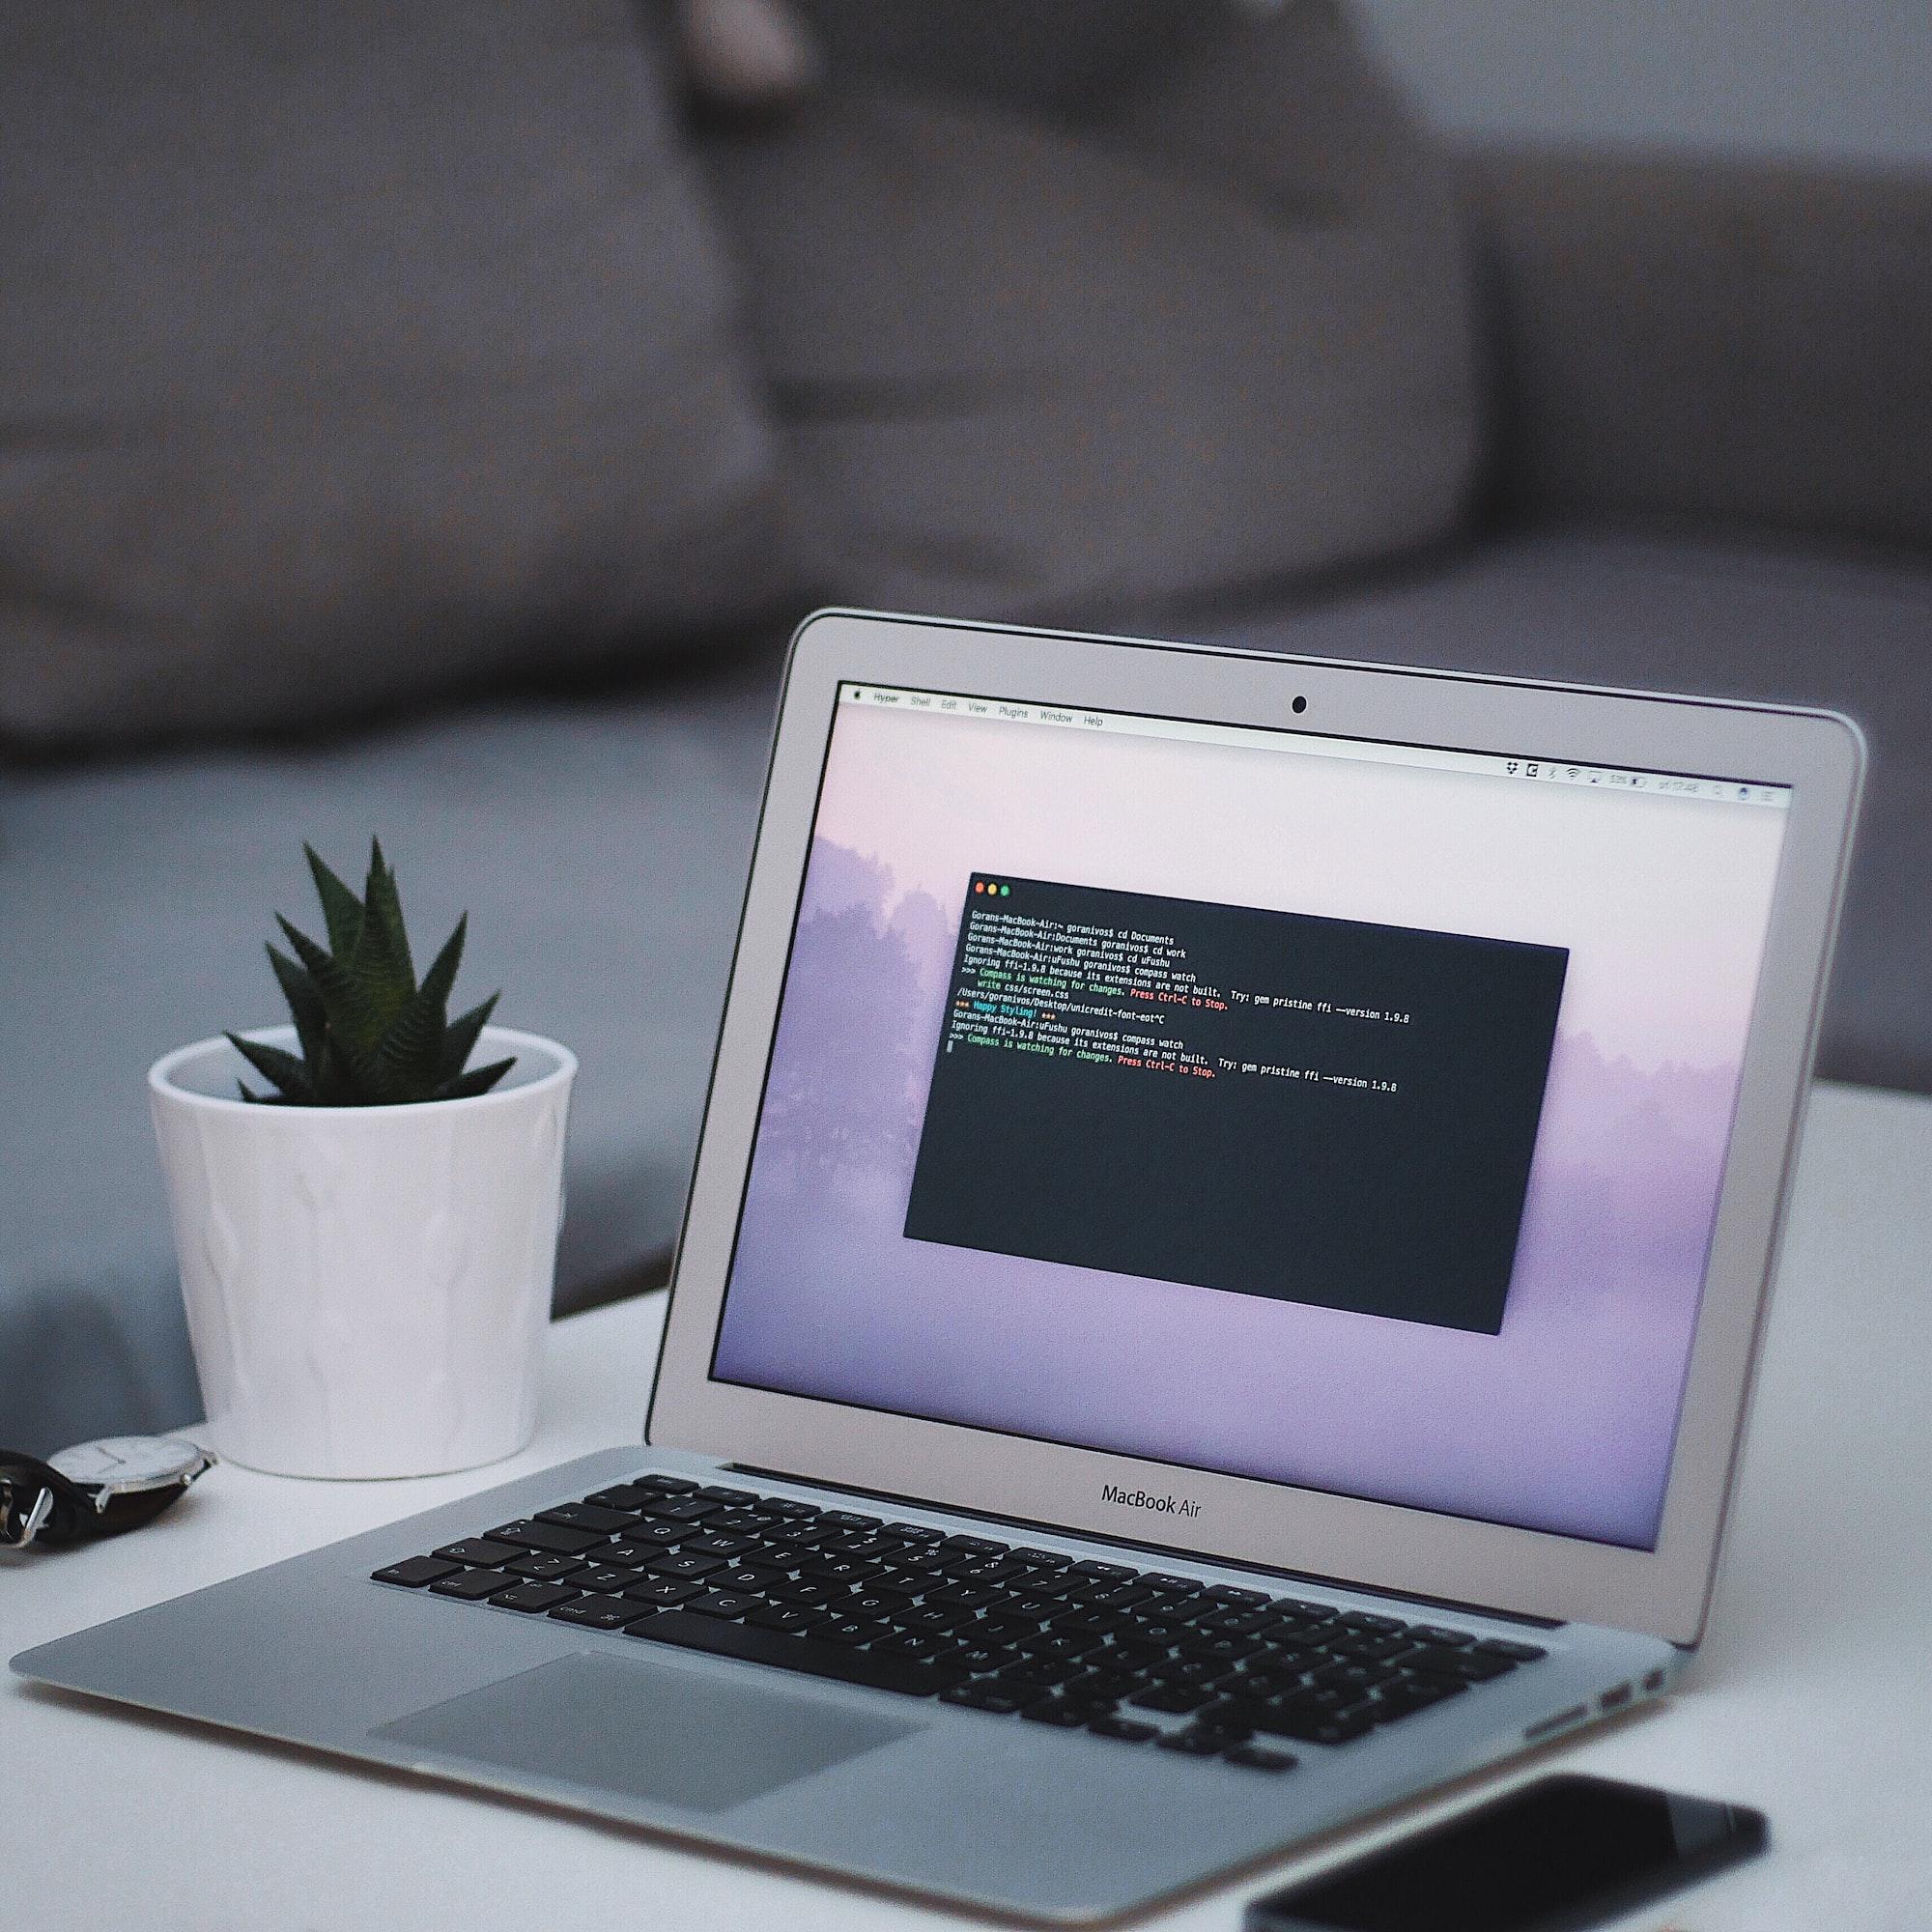 Server ssh key login setup [OSX]